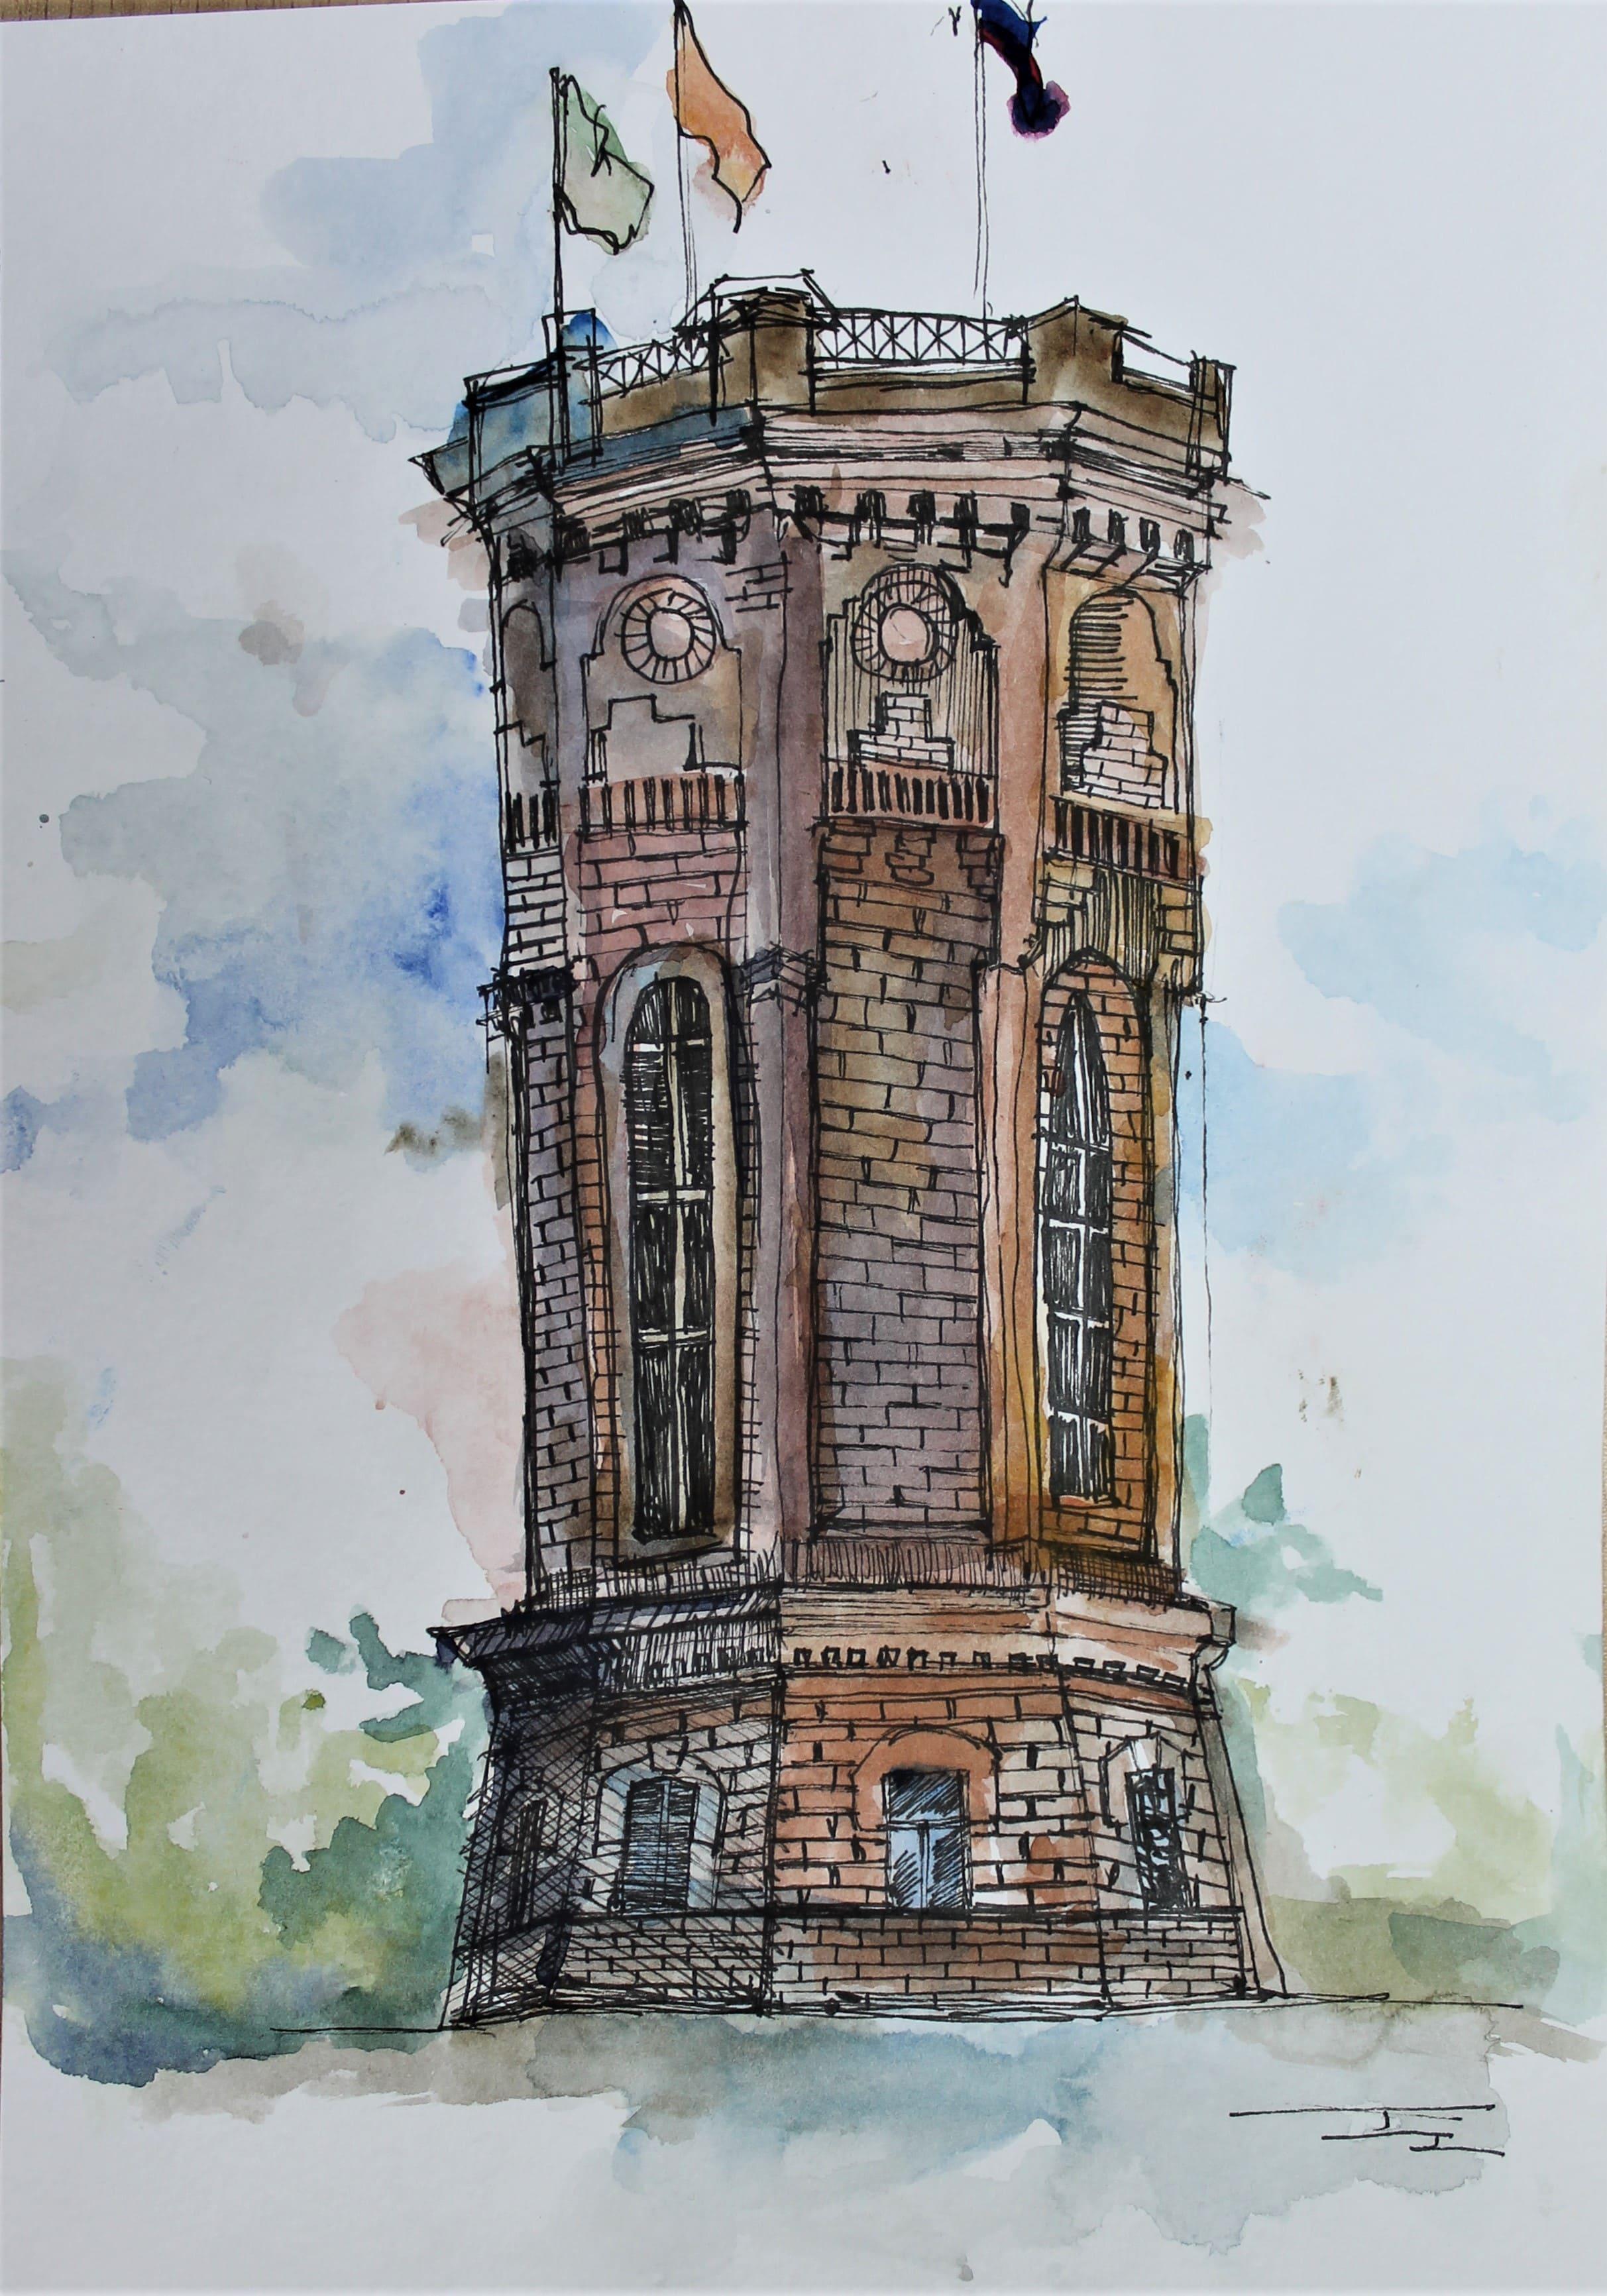 Чащина Дарья 14 лет Кирпичная башня